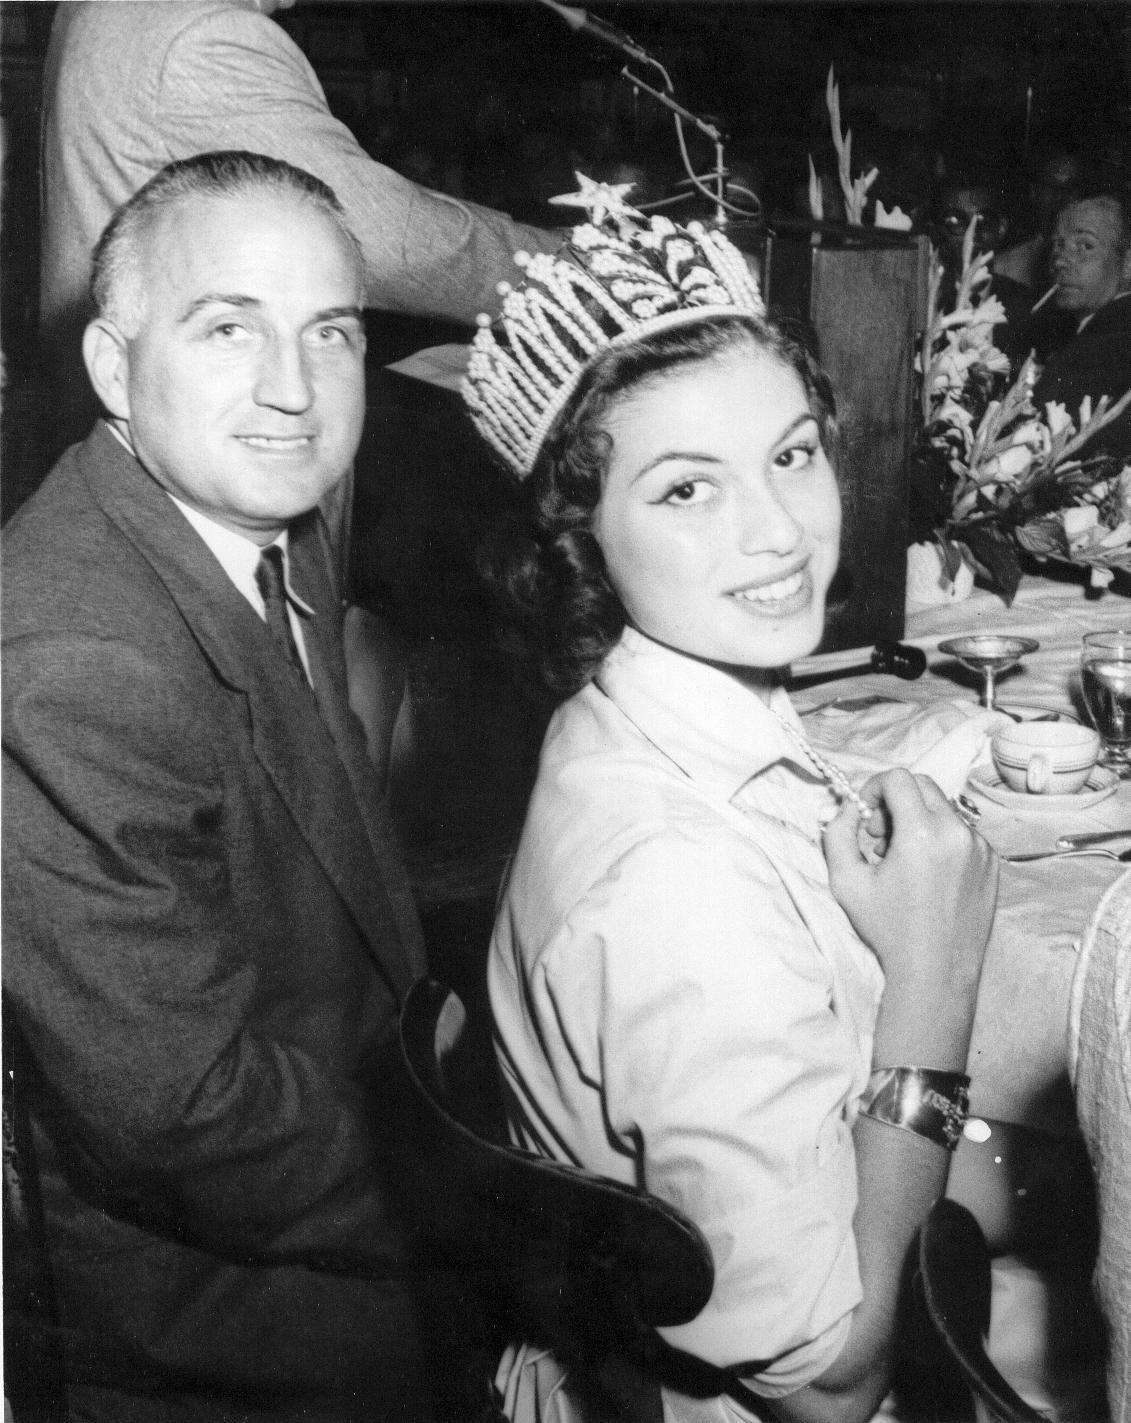 gladys zender, miss universe 1957. primera latina a vencer este concurso. - Página 3 1_jess10